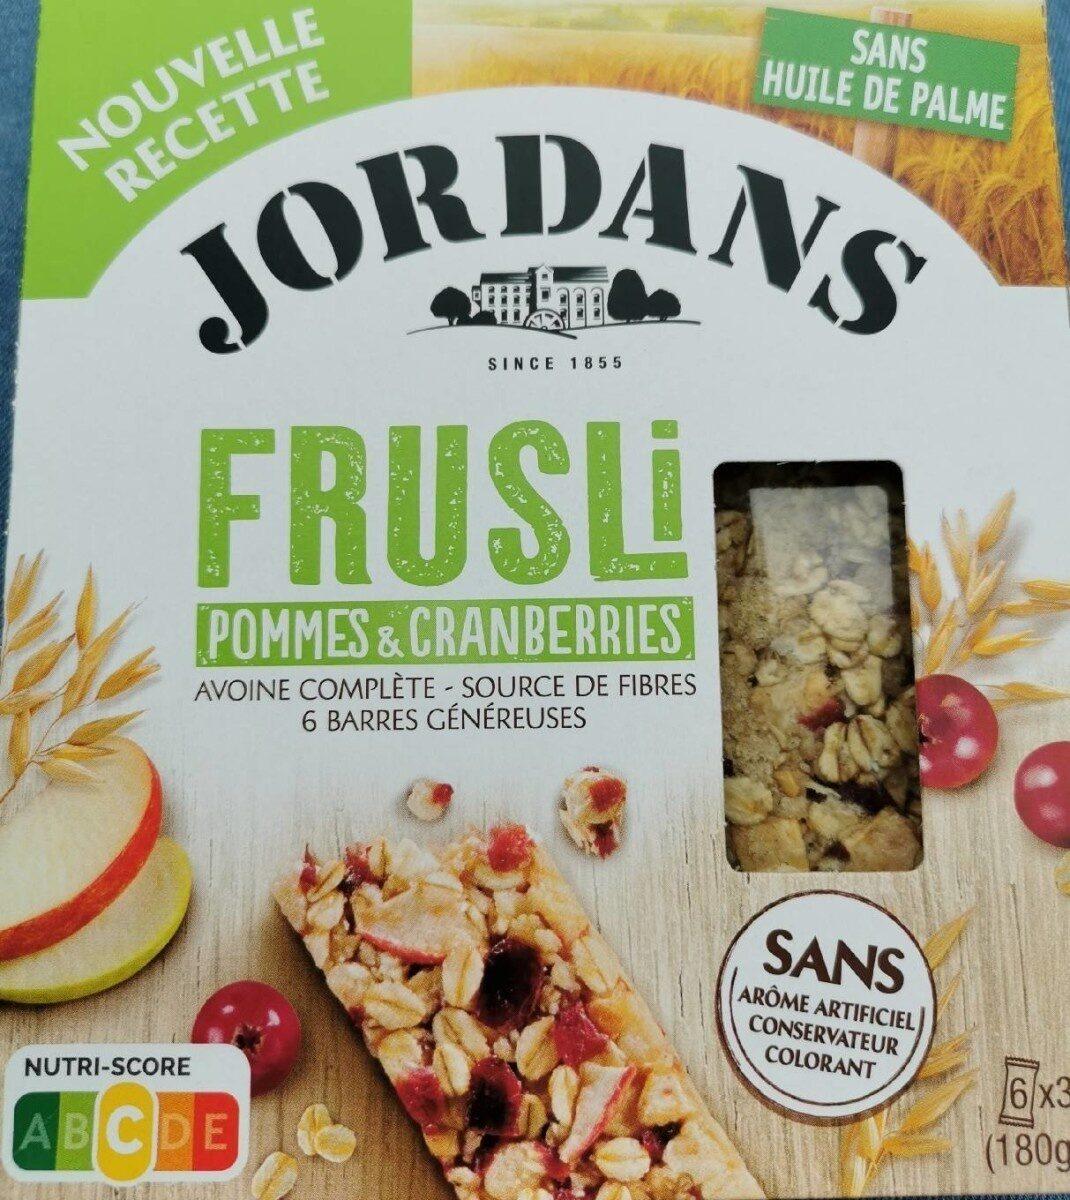 Frusli pommes & crandberries - Product - fr